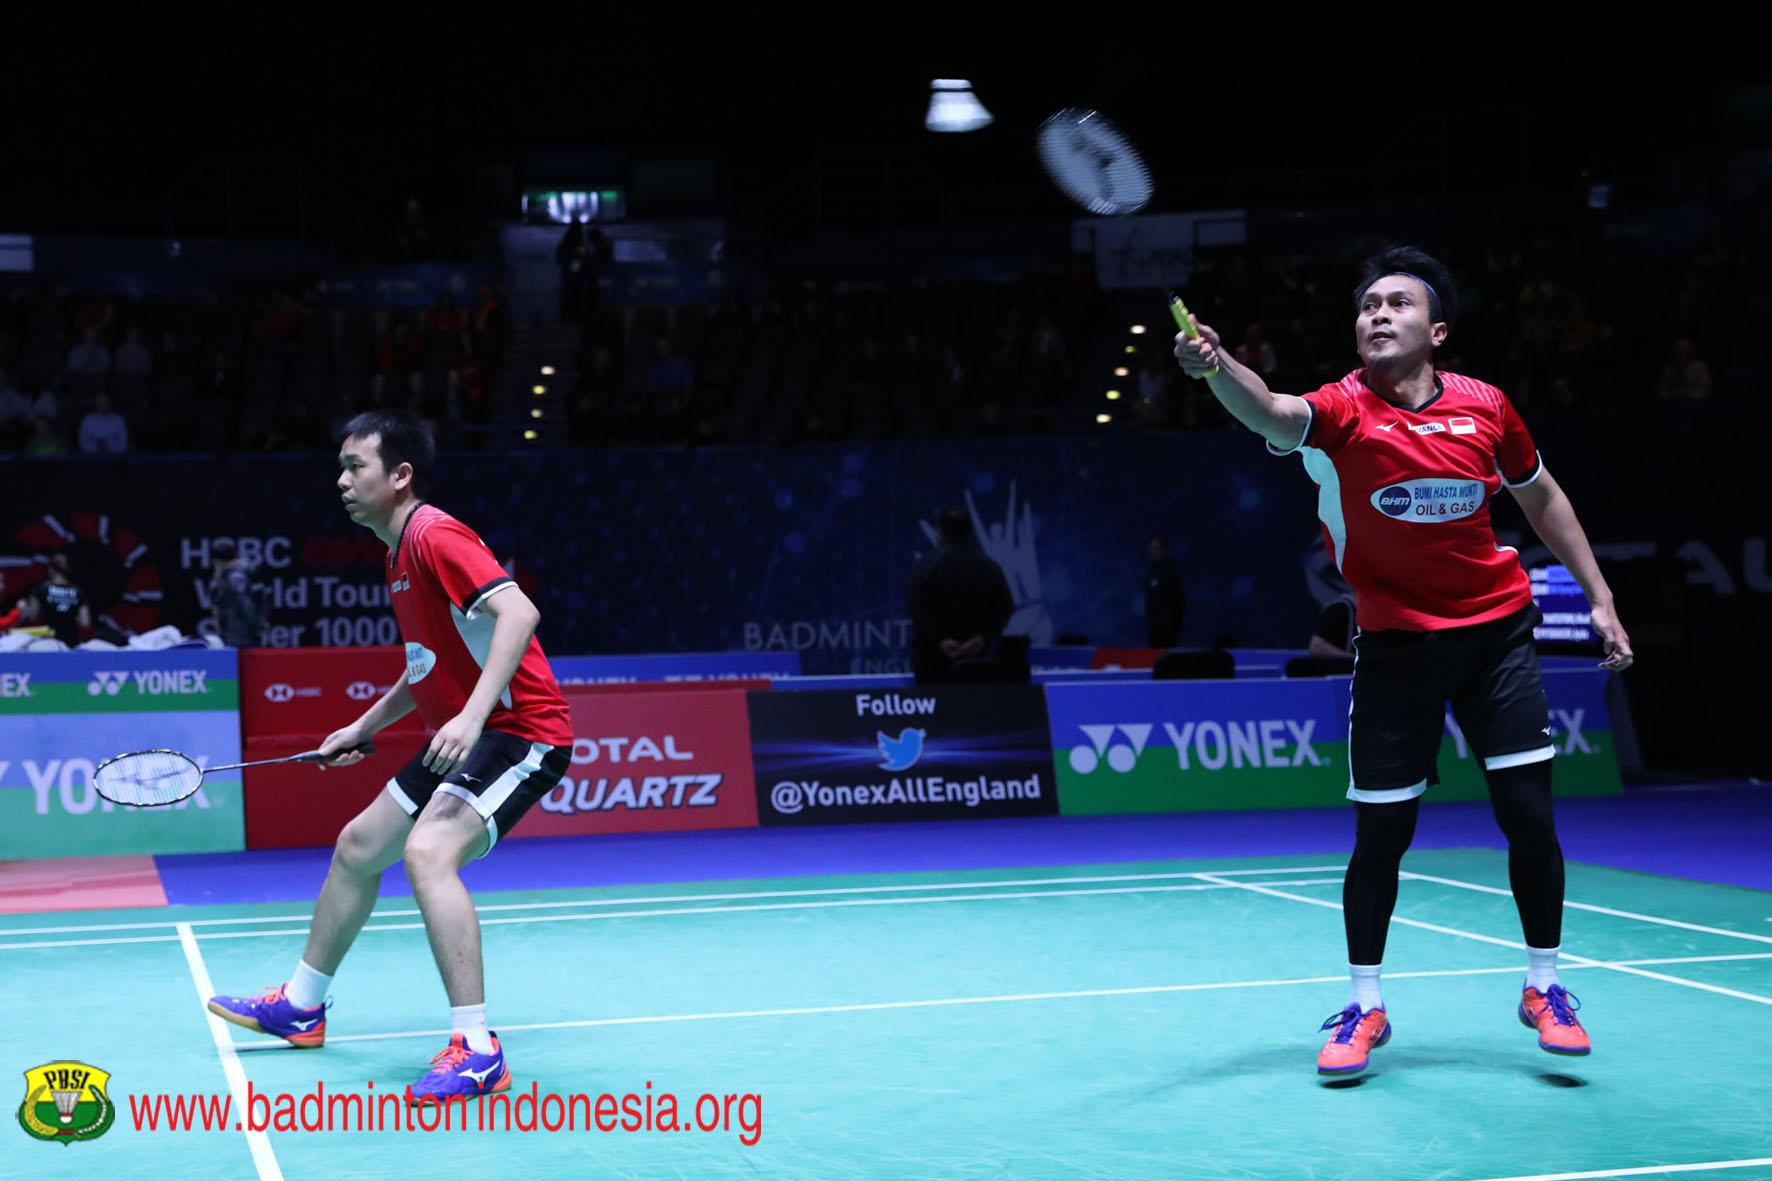 https: img-k.okeinfo.net content 2019 04 12 40 2042677 ikuti-jejak-marcus-kevin-hendra-ahsan-ke-semifinal-singapura-open-2019-DUDYR5tw1l.jpg